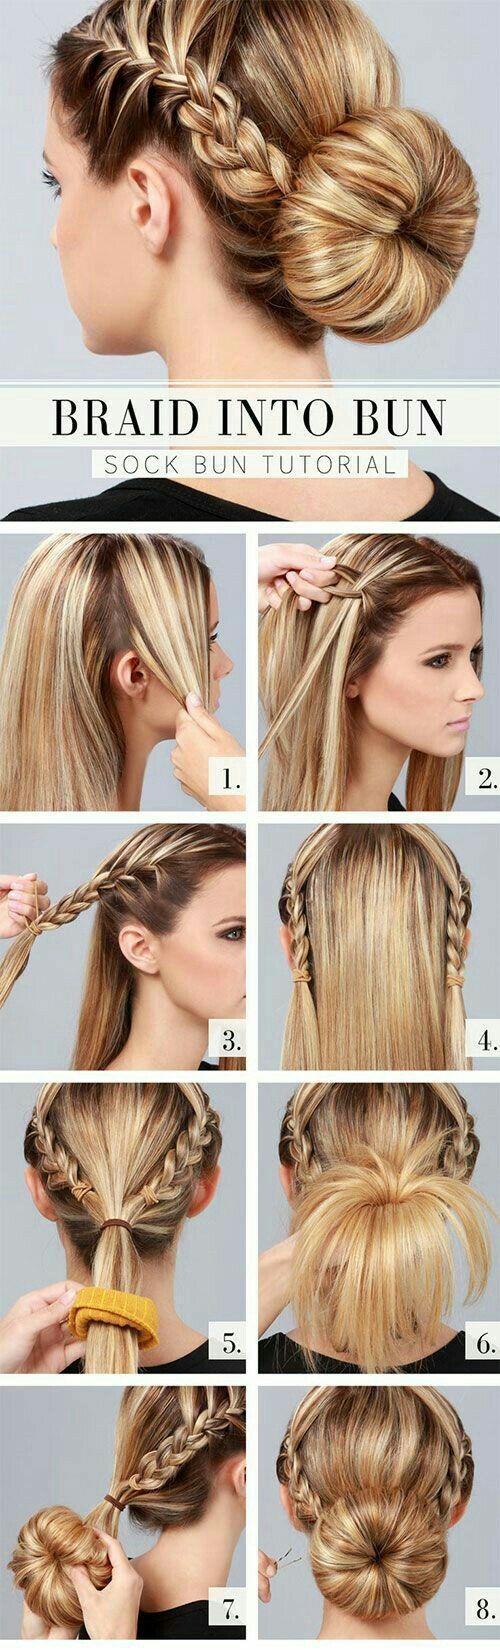 Braid into bun easiest u beautiful step by step braid tutorials